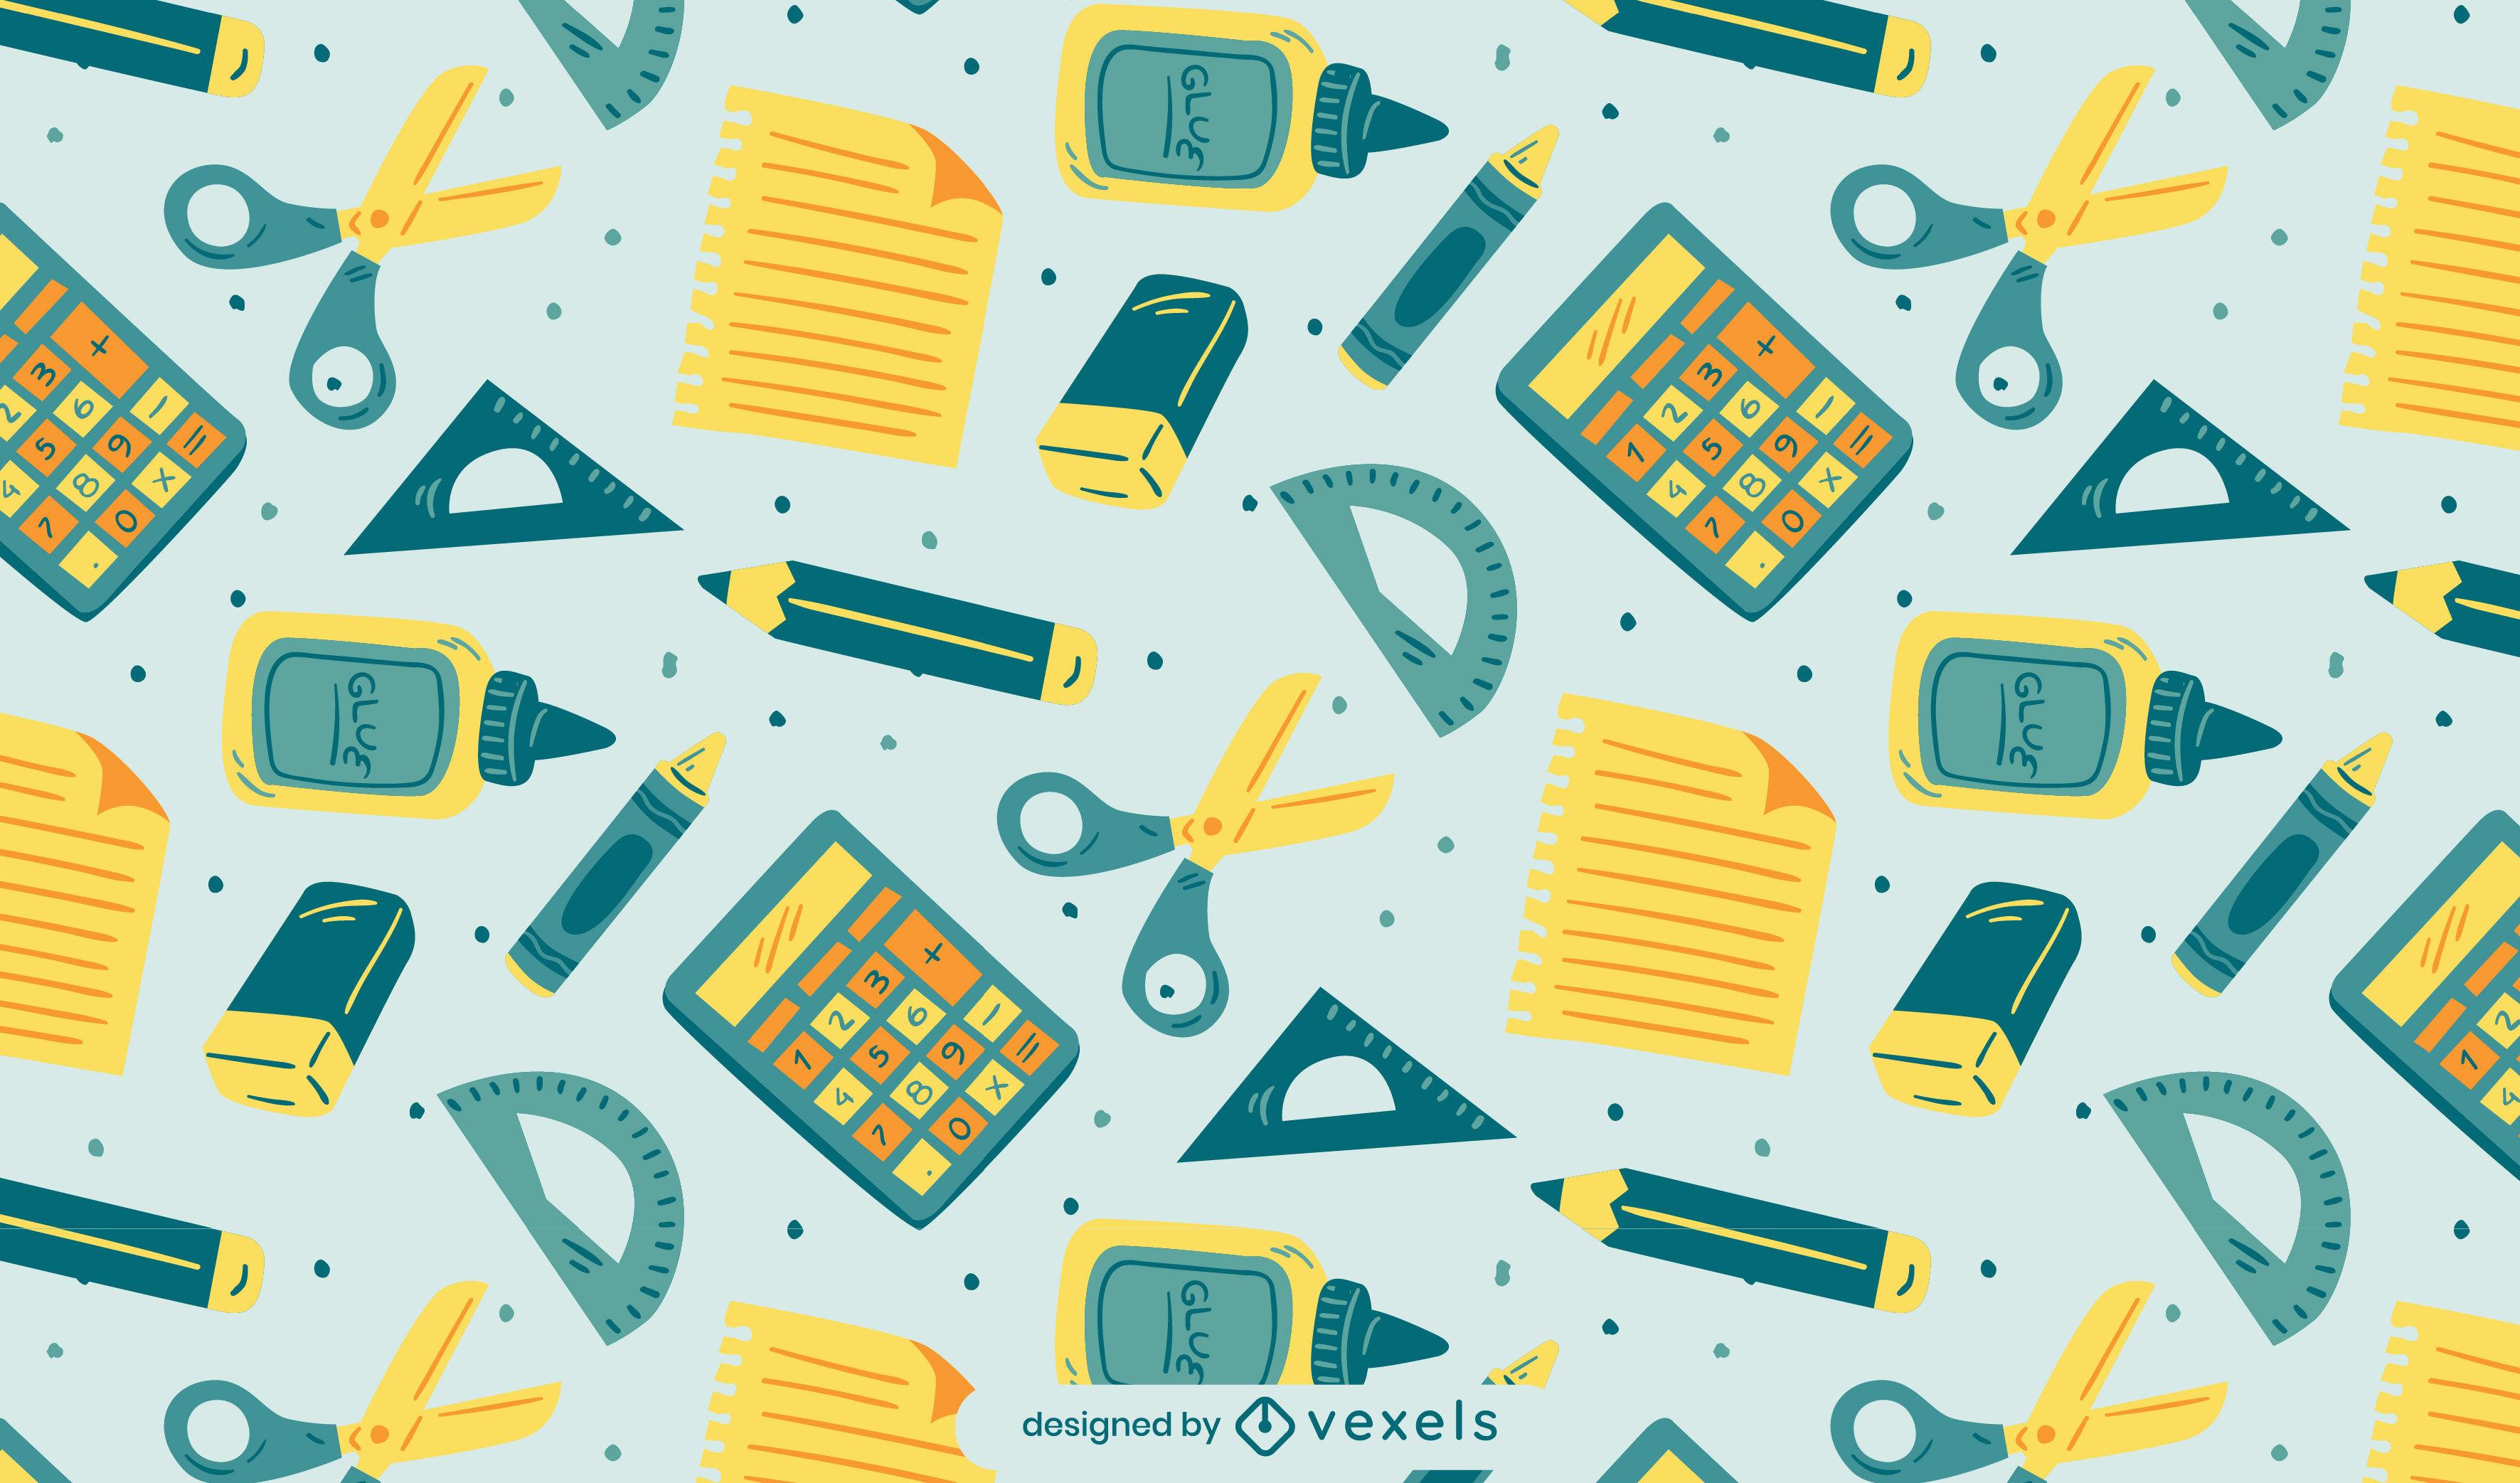 Diseño de patrón de educación de útiles escolares